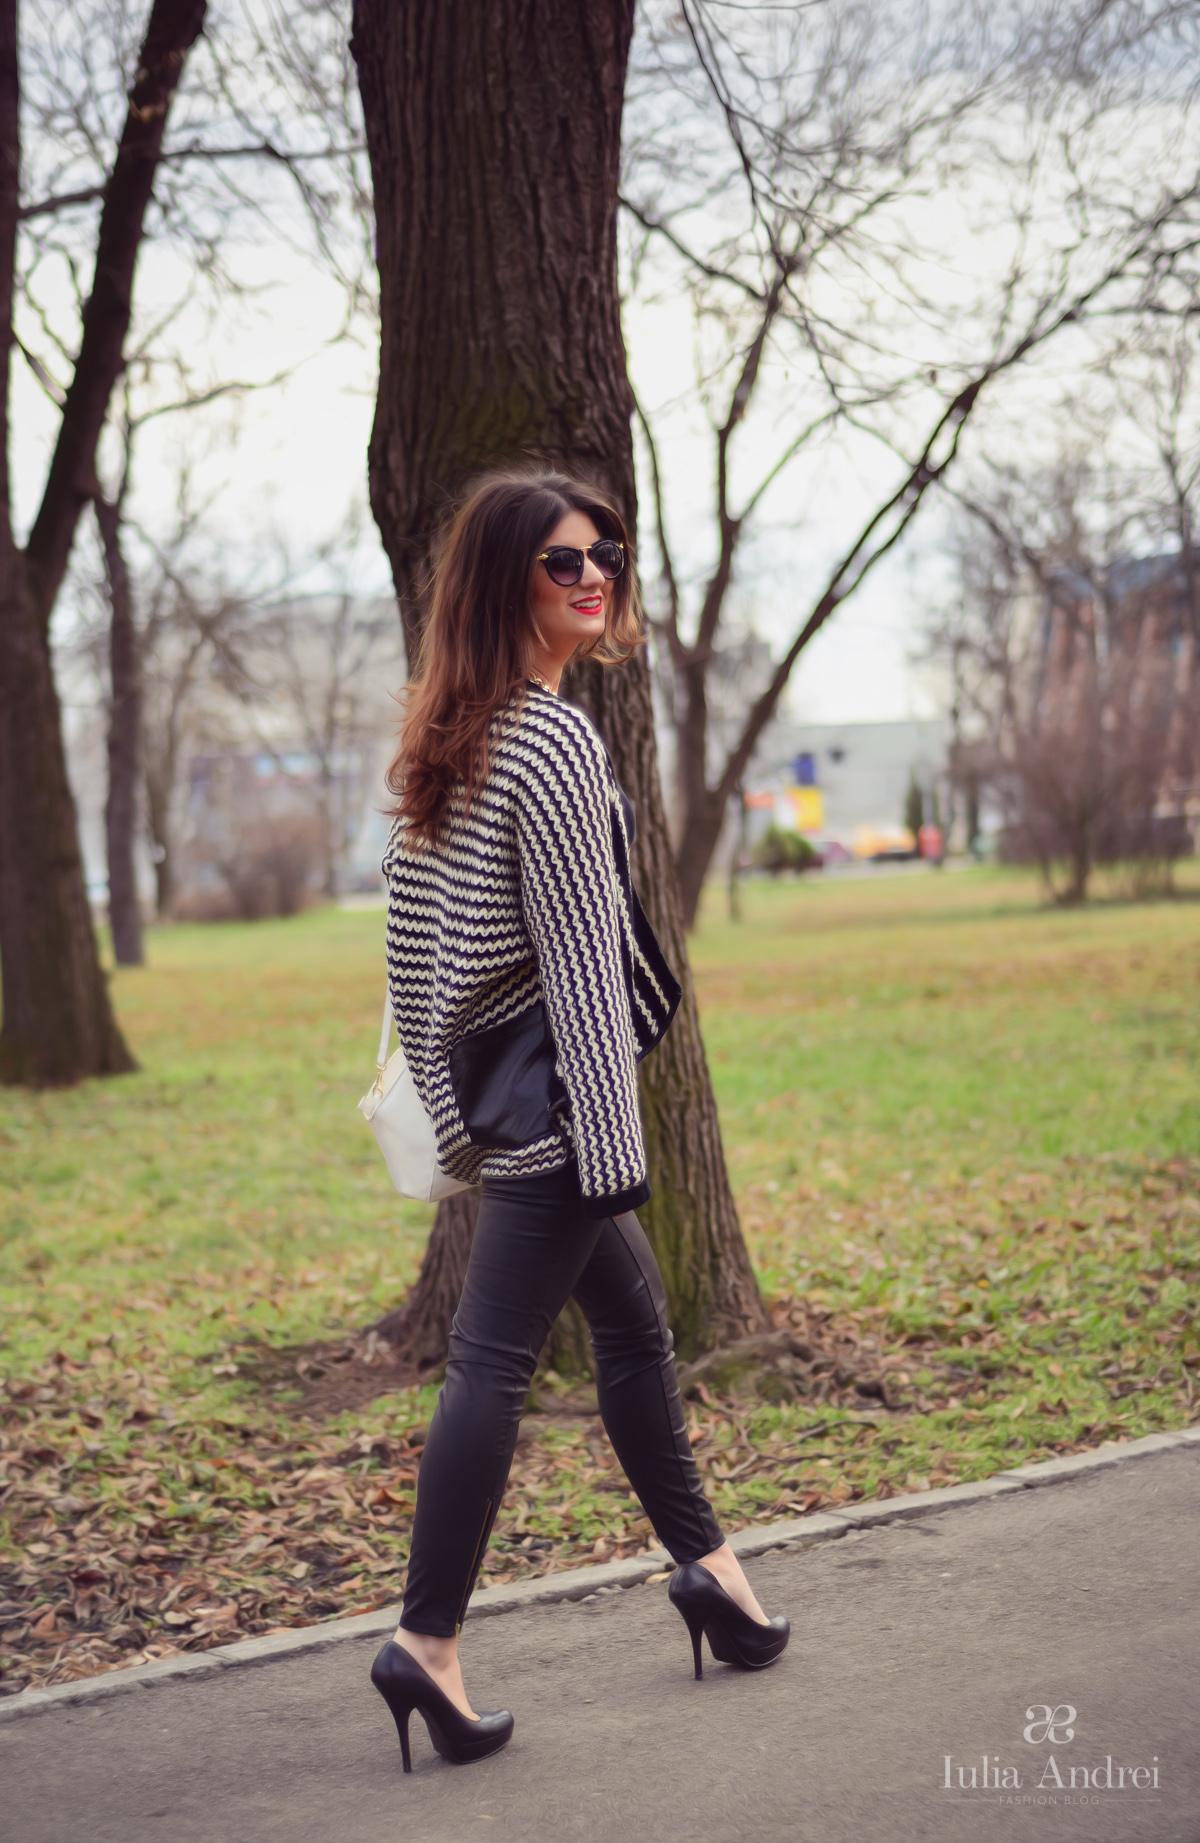 tinuta cardigan tricotat alb negru pantaloni din piele si ochelari de soare iulia andrei fashion blog